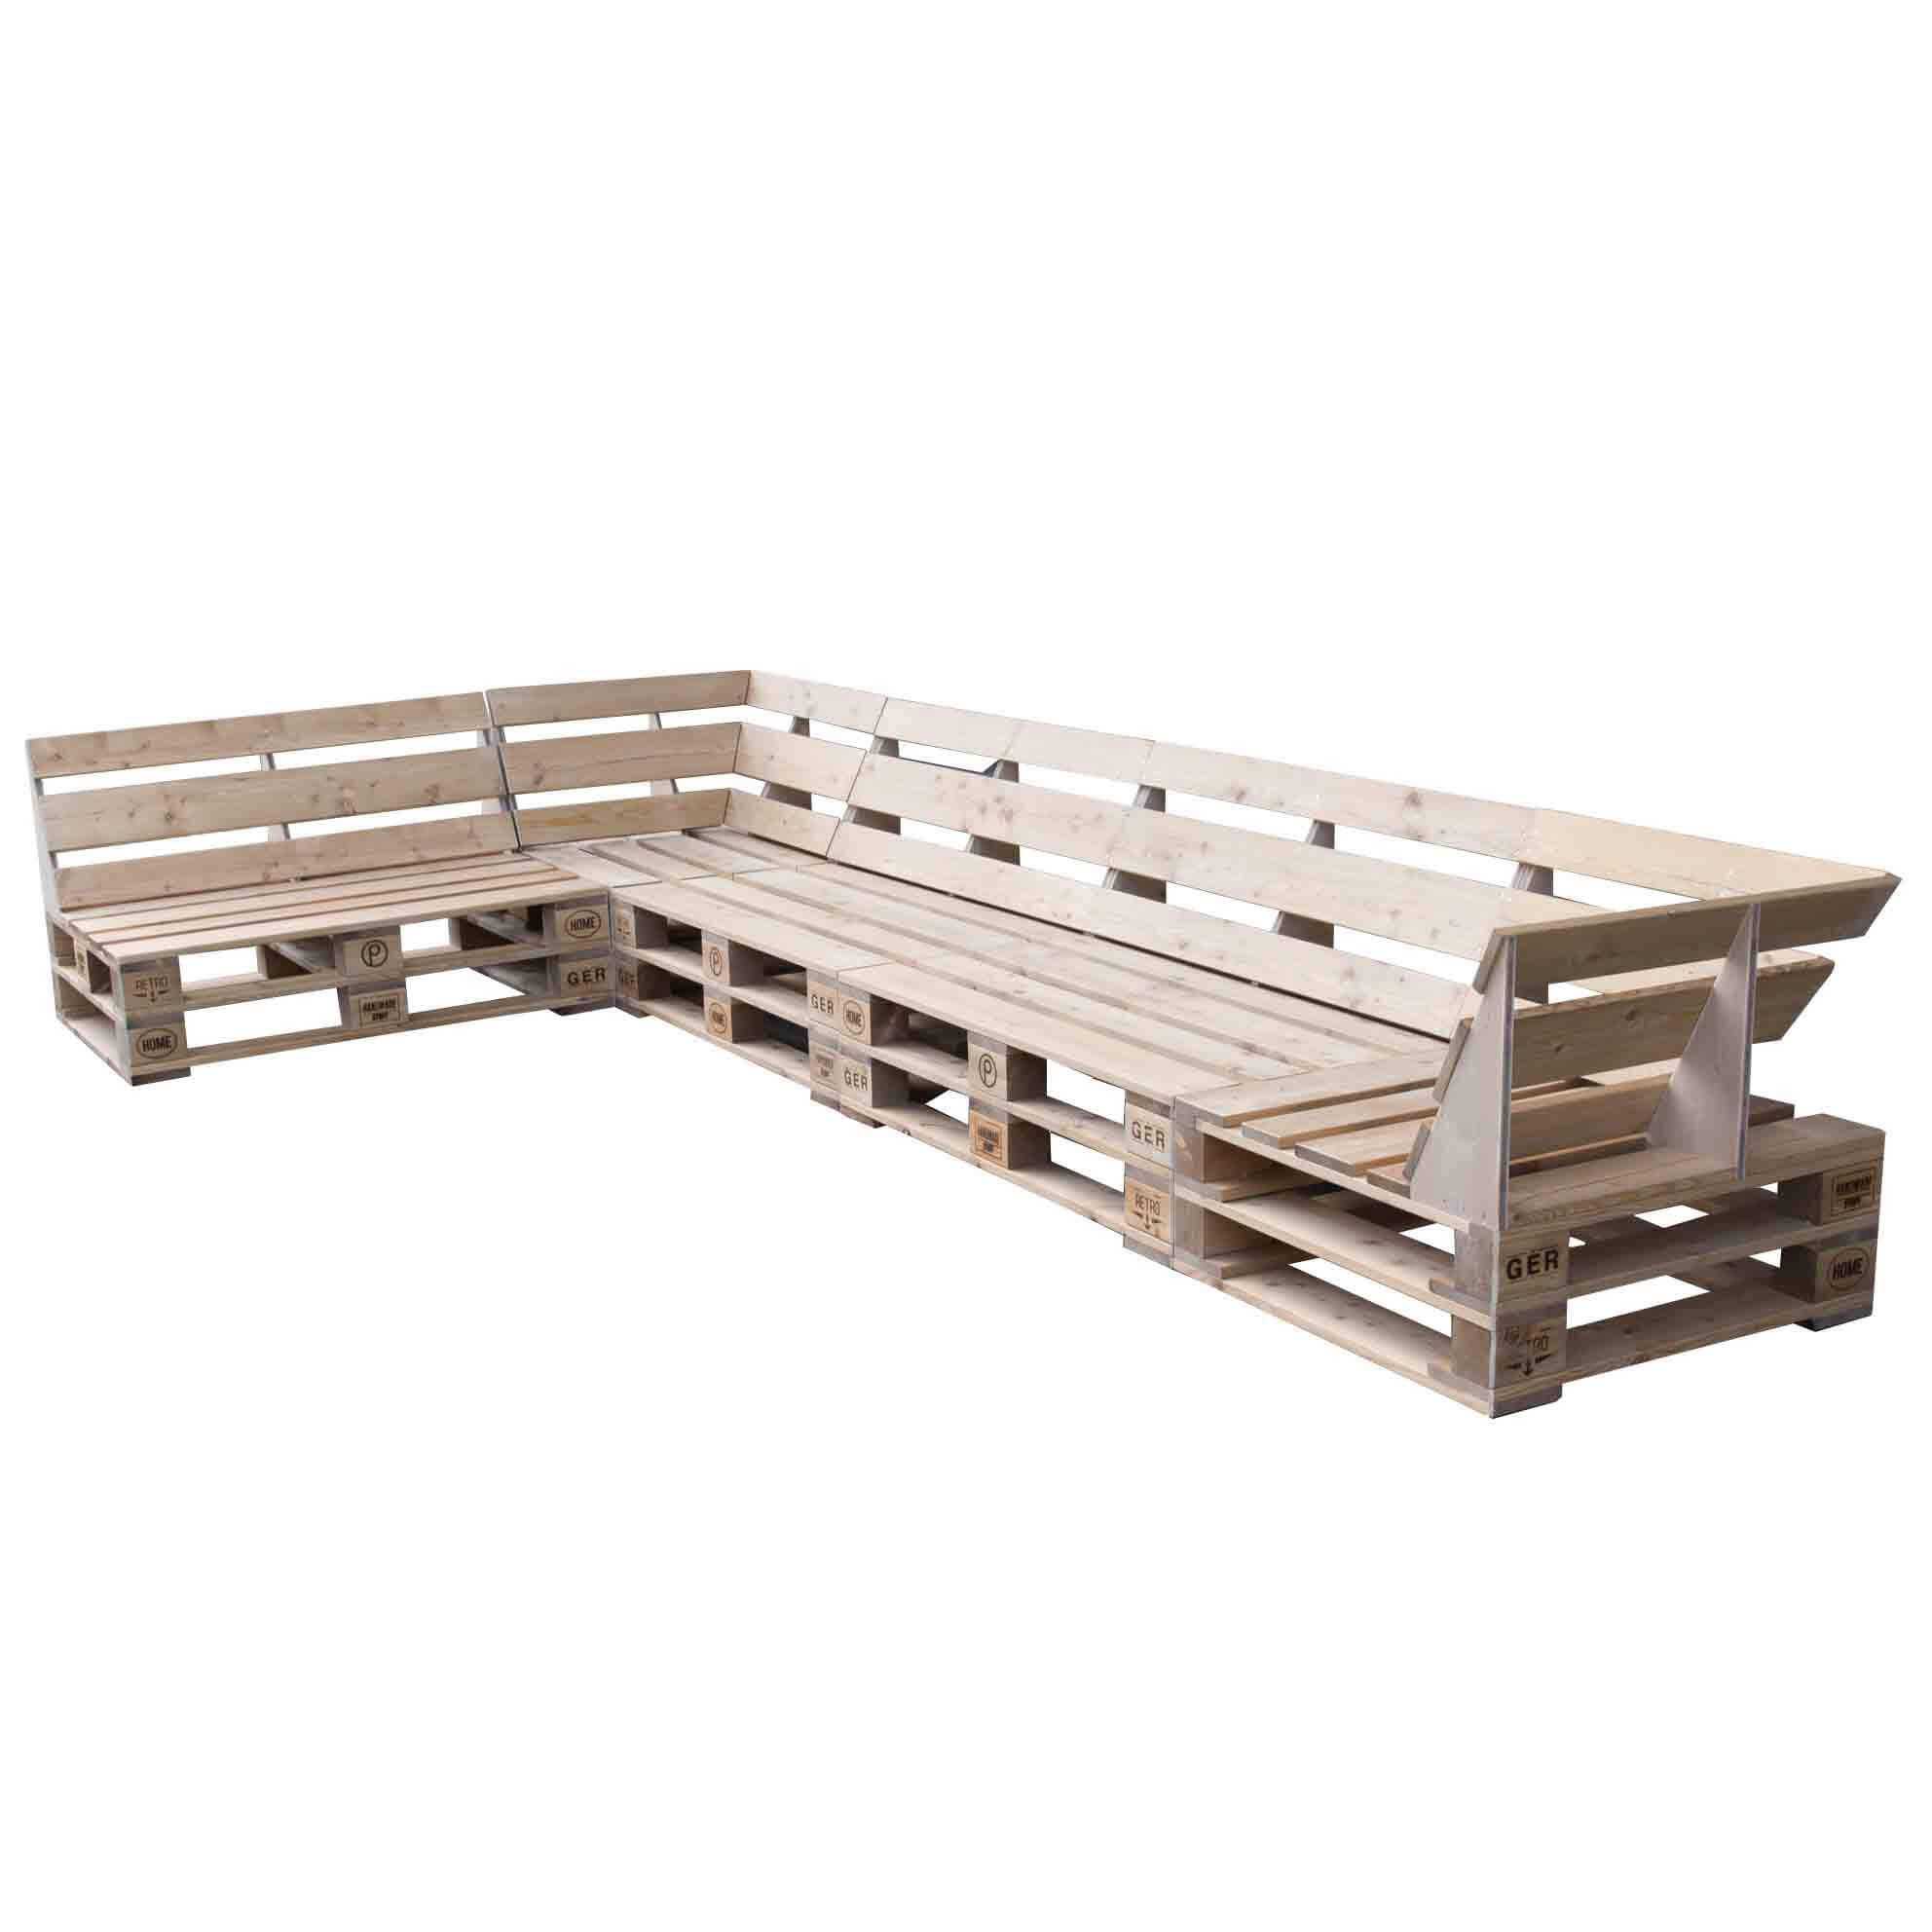 ᐅᐅ Palettensofa – Premium Lounge aus Paletten | Palettenmöbel Shop